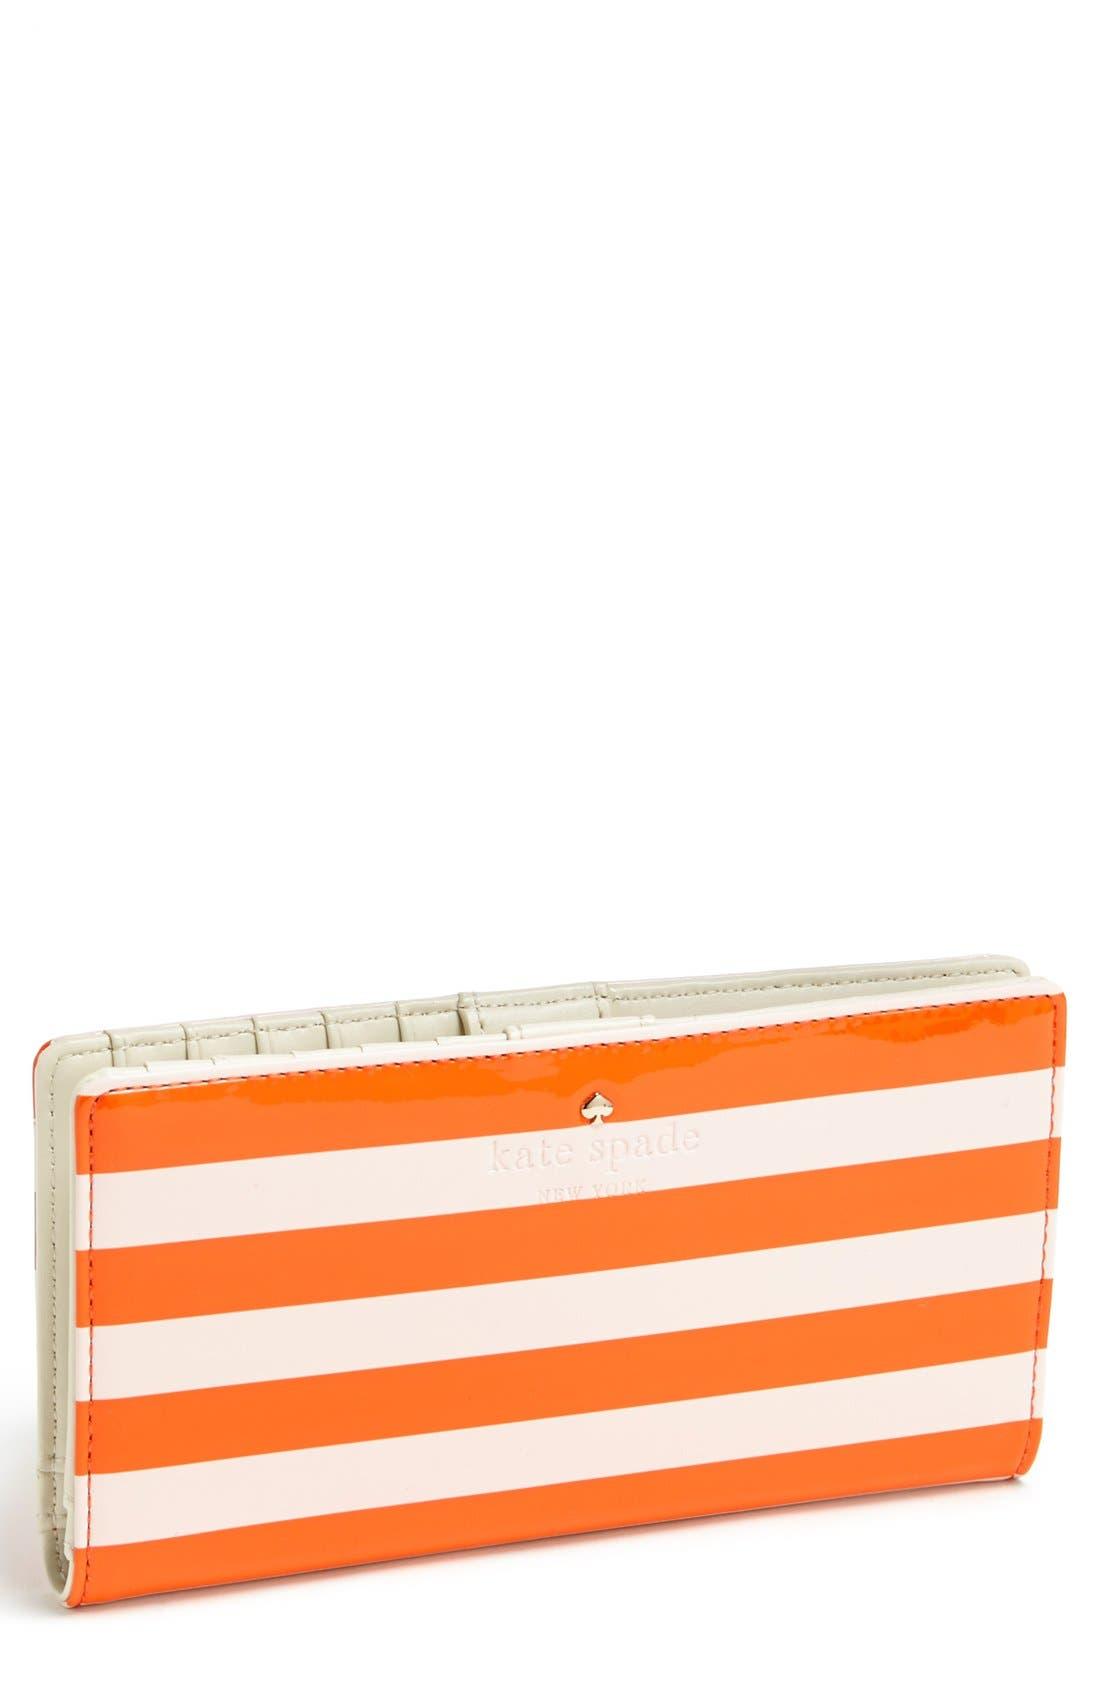 Alternate Image 1 Selected - kate spade new york 'harrison street stripe - stacy' wallet